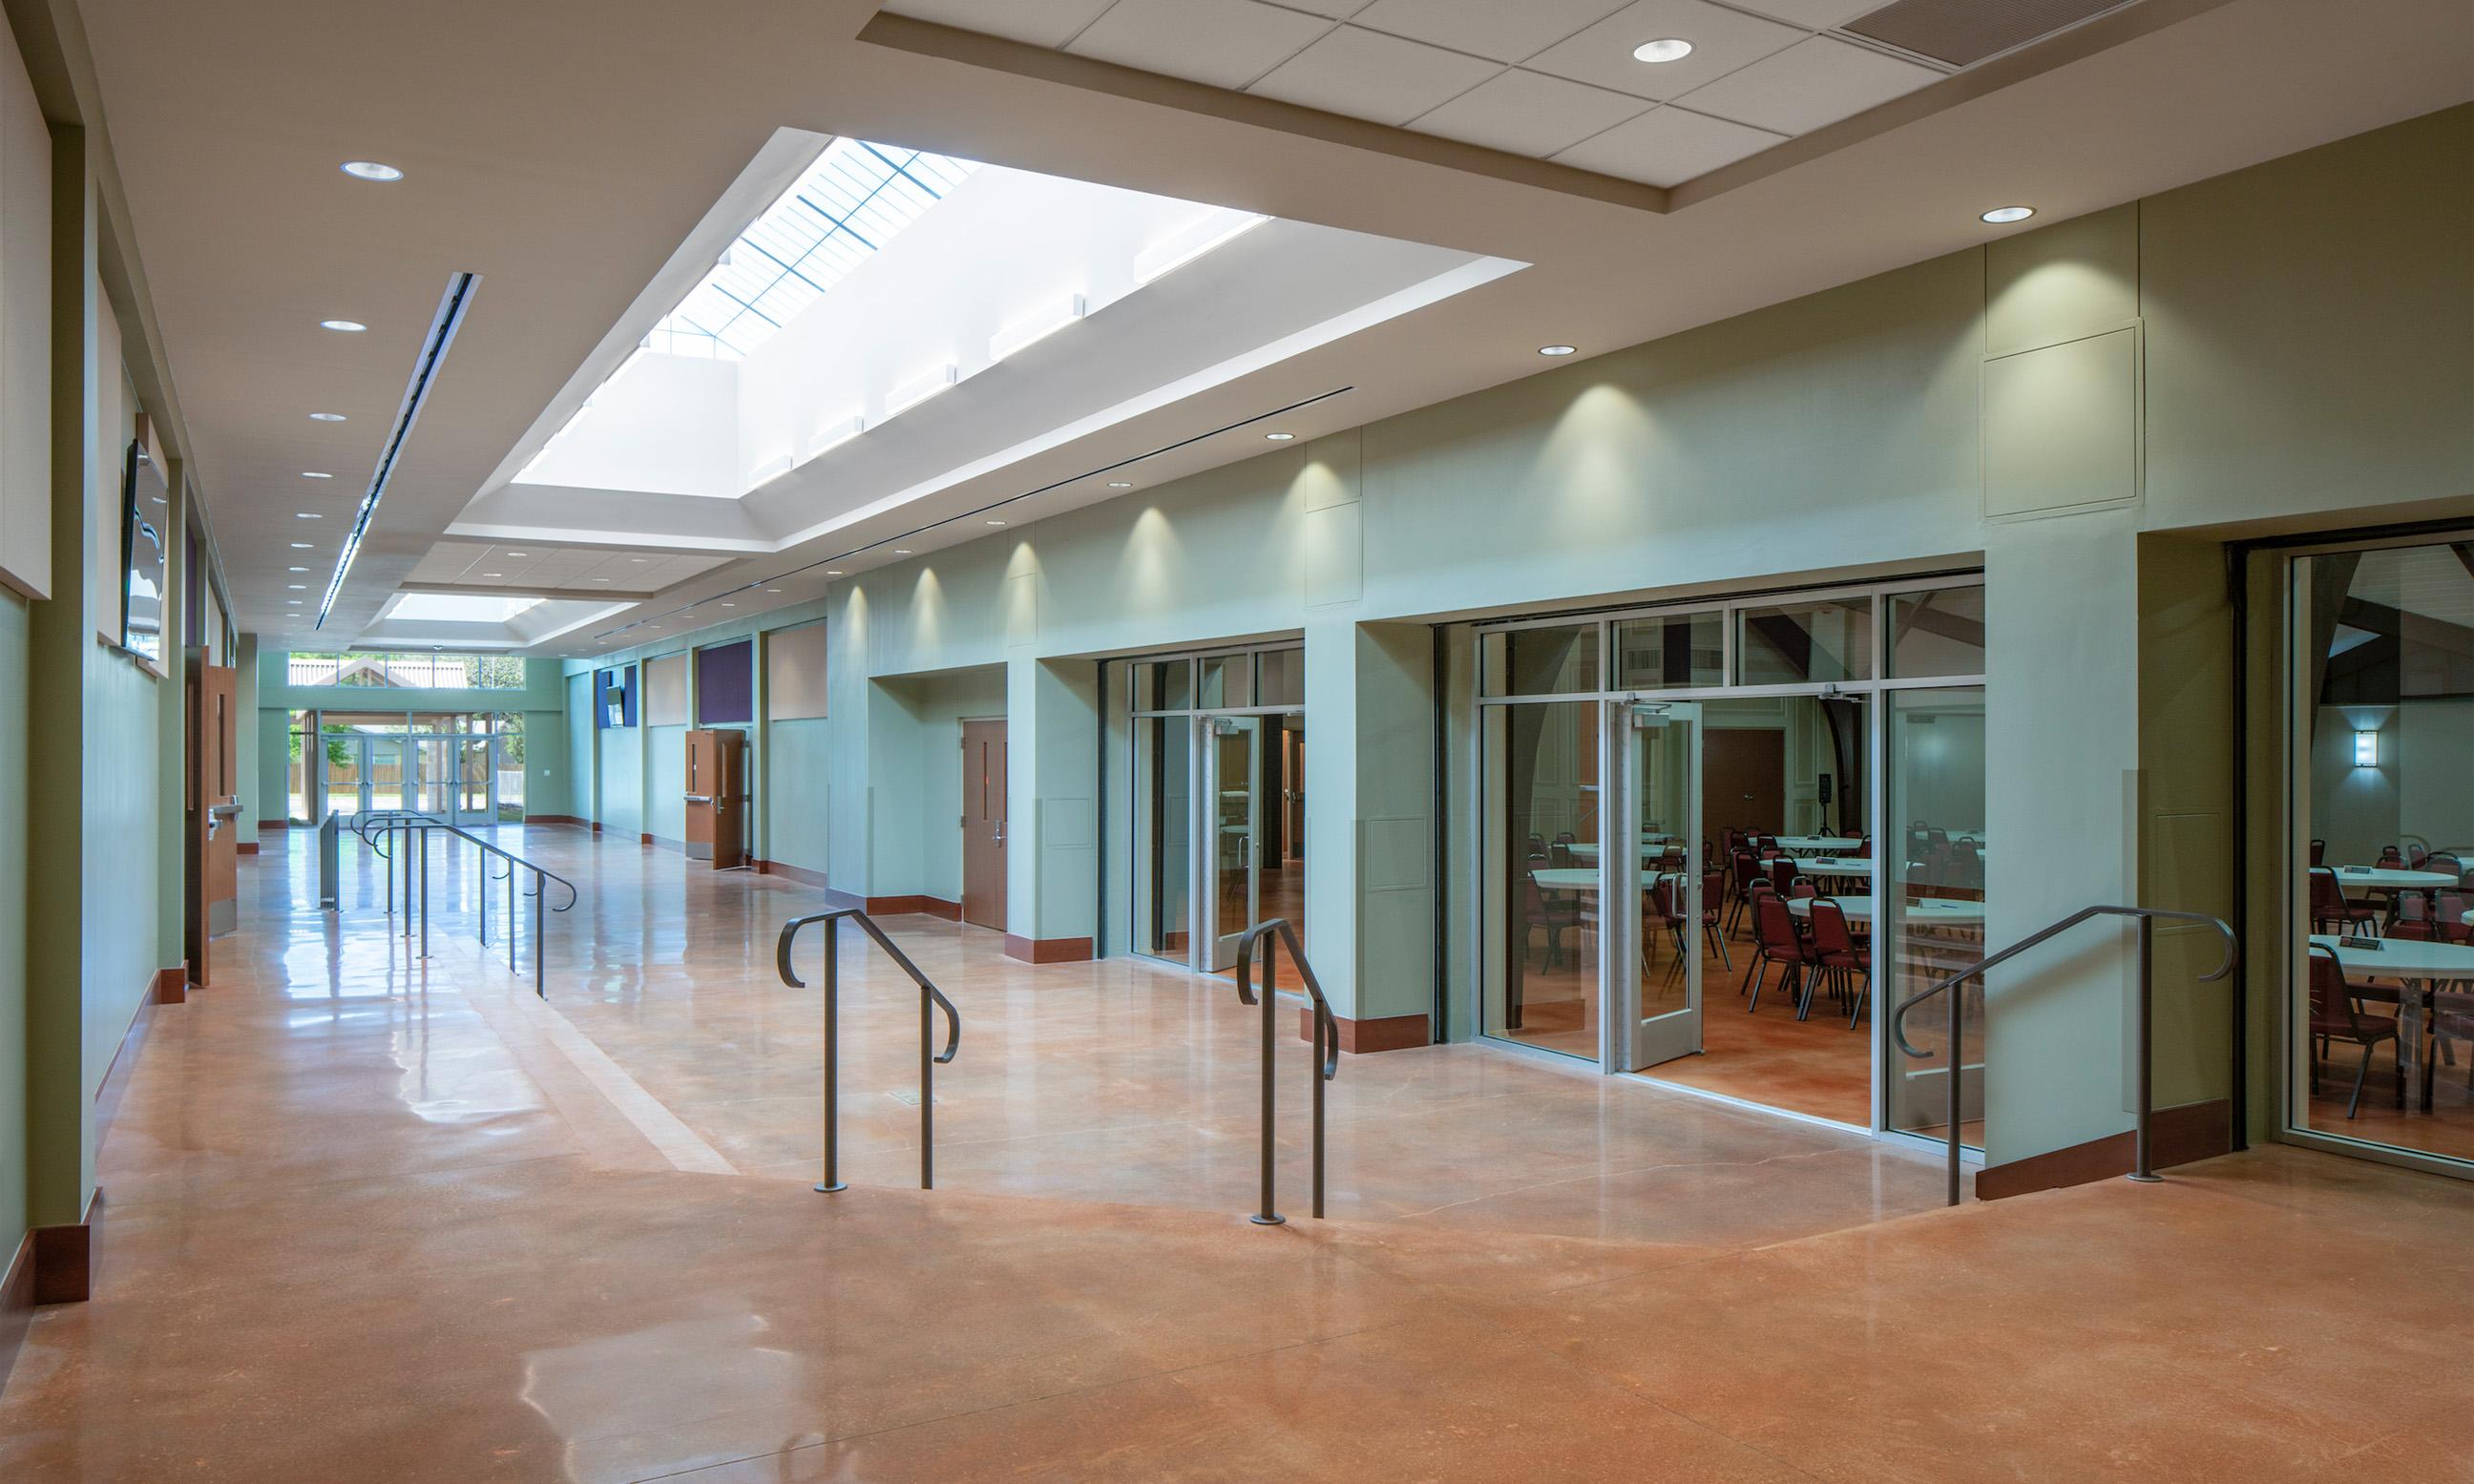 Woodlawn Baptist Church Foyer Connection Center, Austin, TX, Heimsath Architects Church Design Specialists